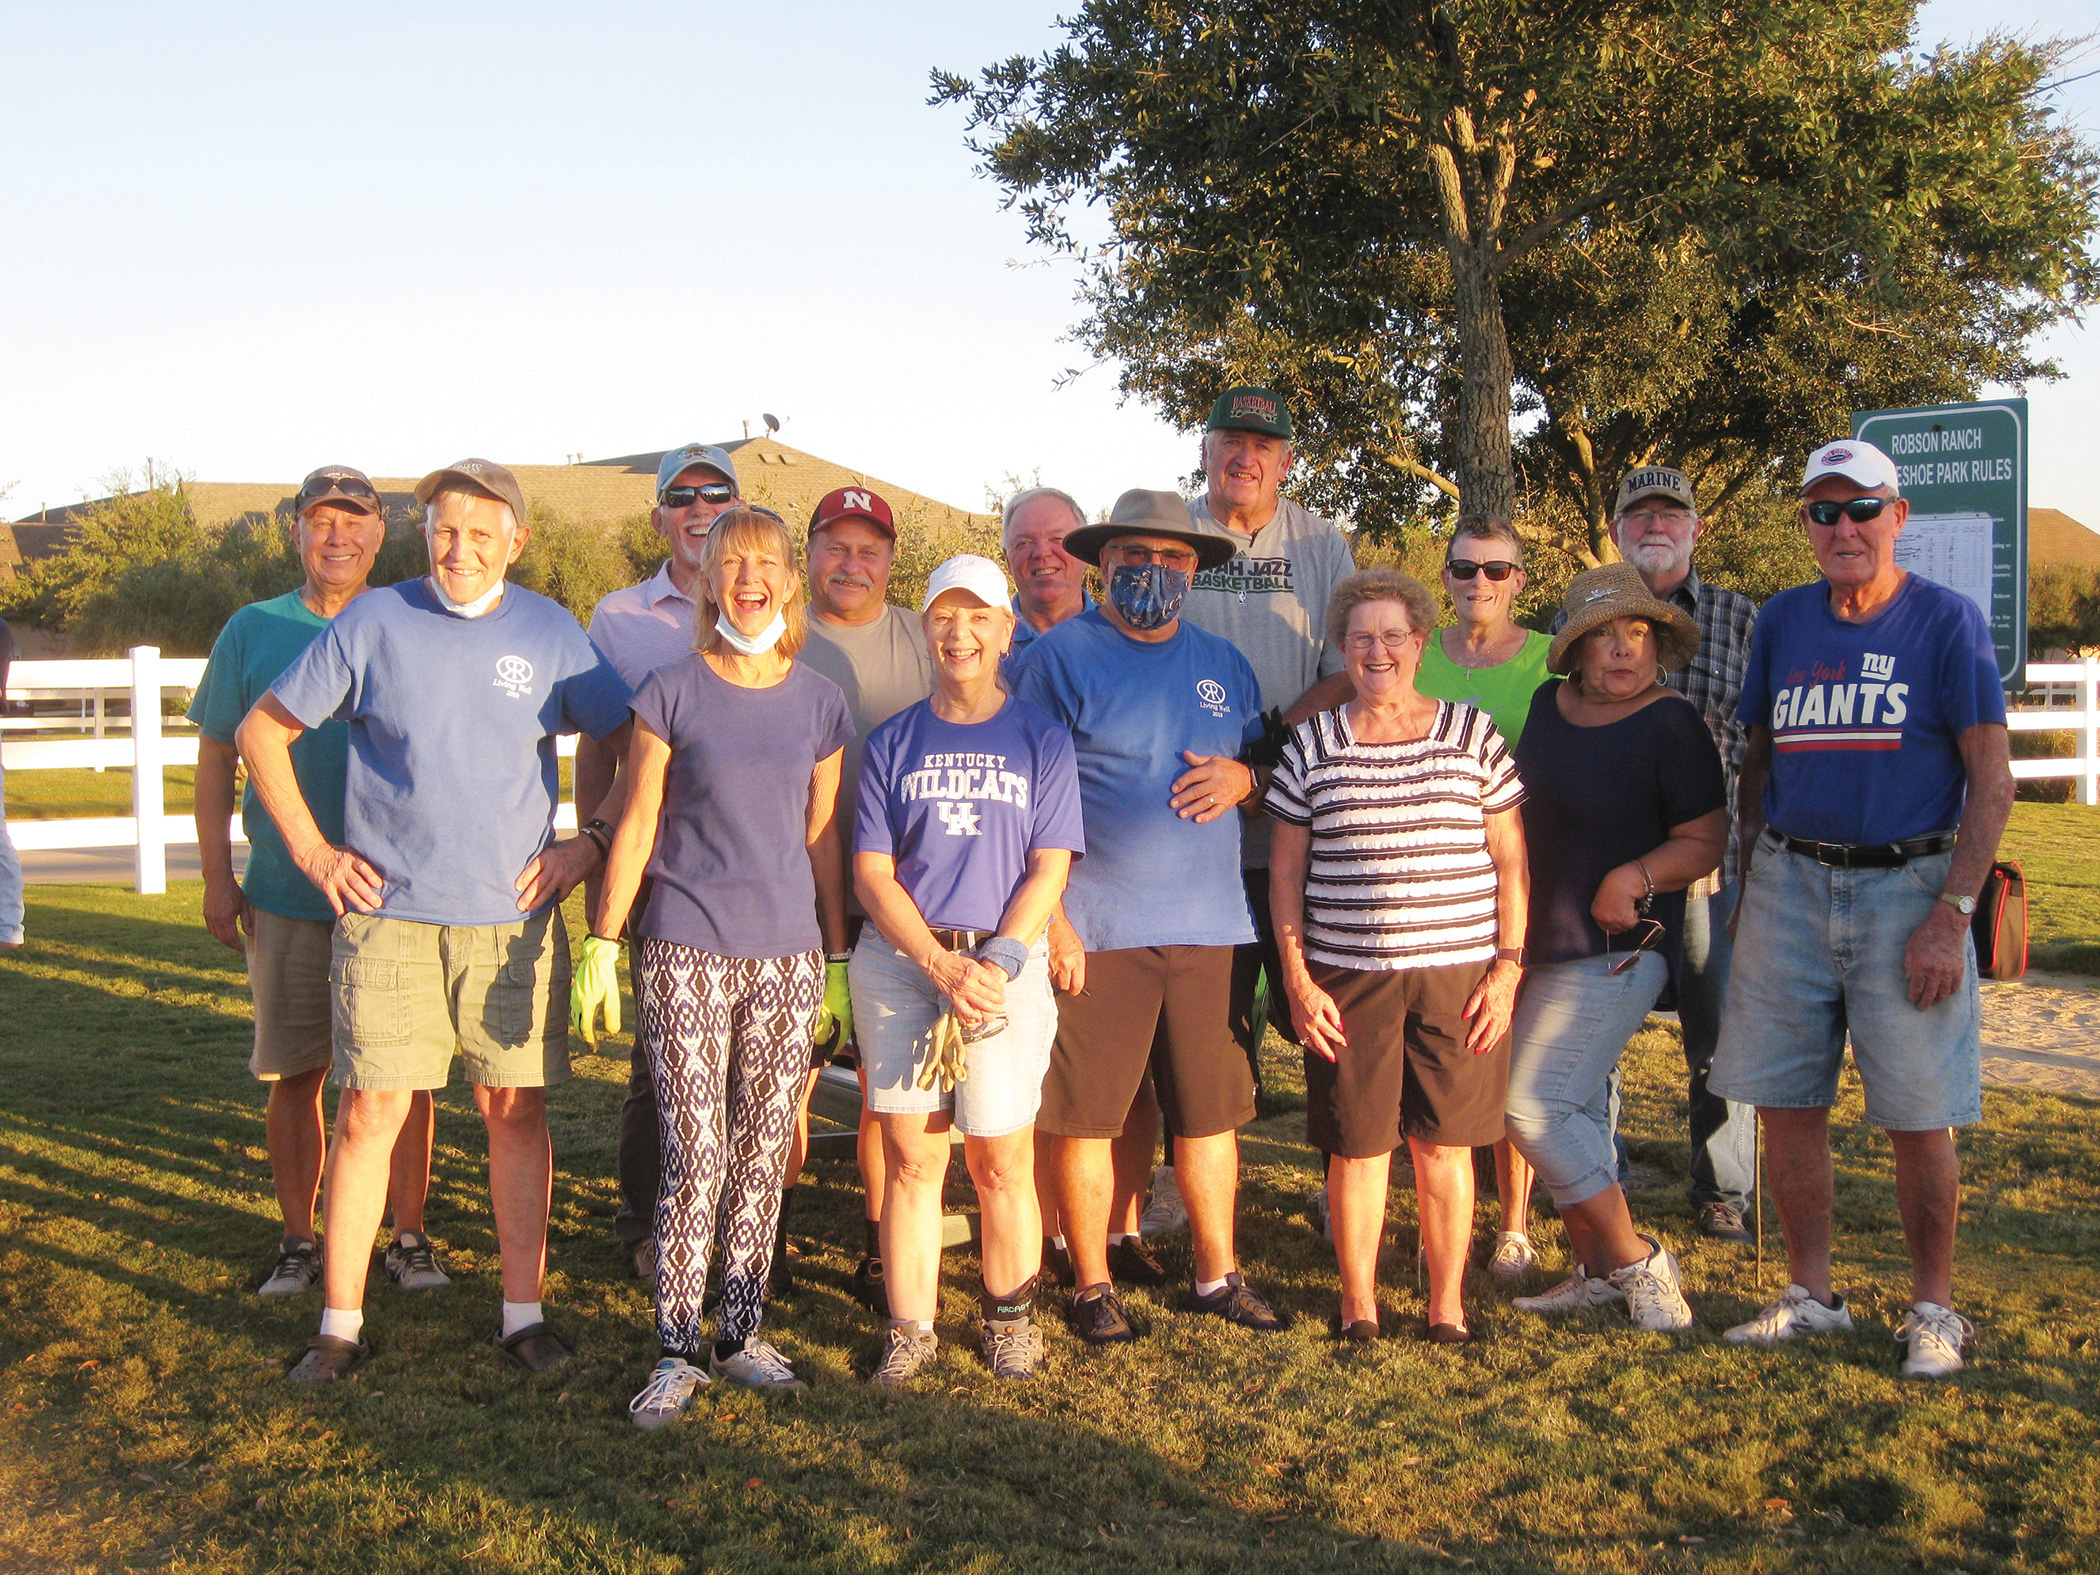 Participants in horseshoe tourney